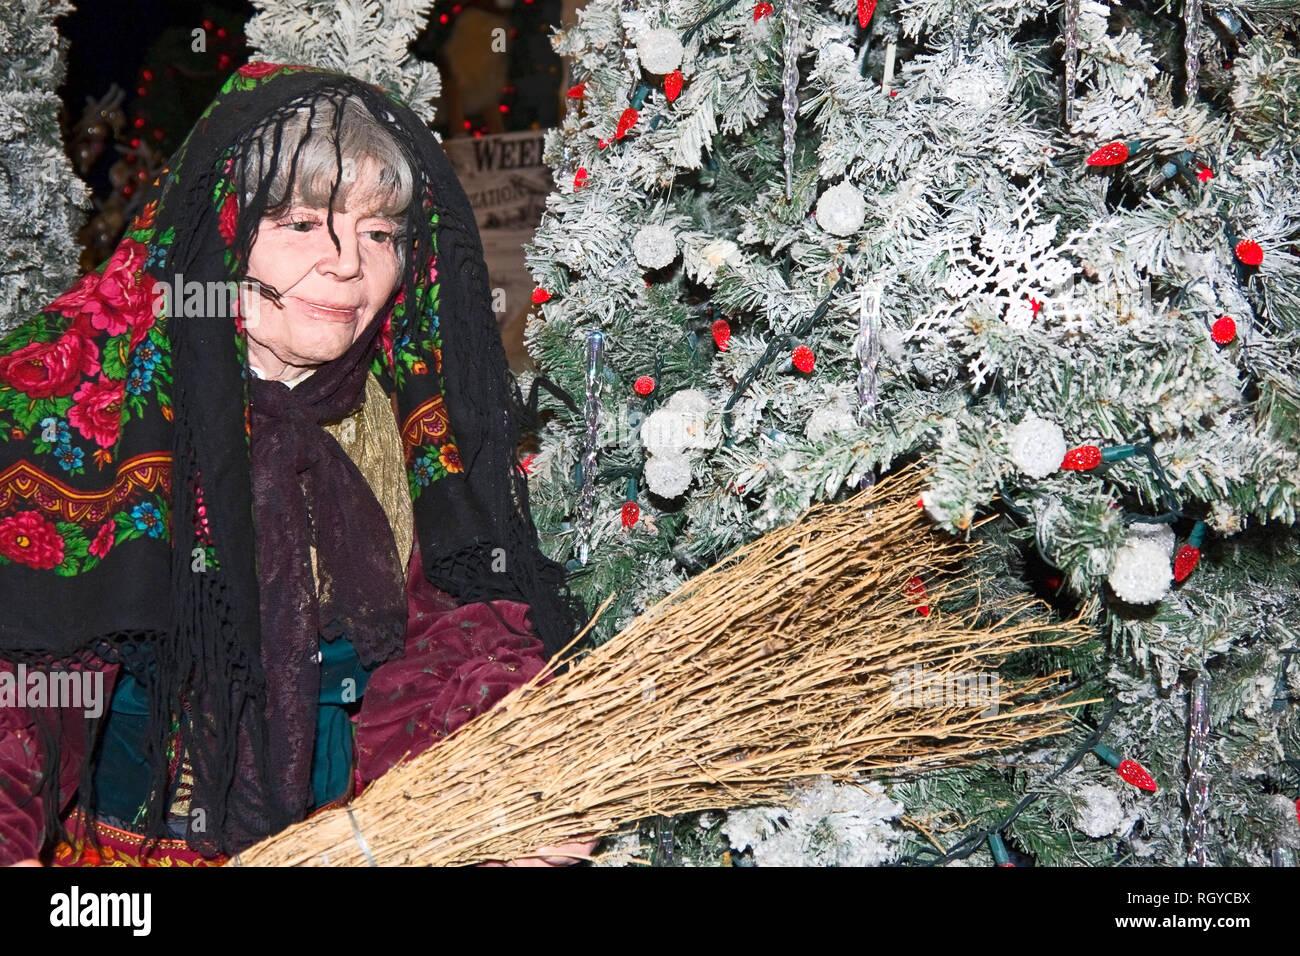 La Befana of Italy figure; twig broom; head scarf; decorated Christmas tree; holiday decoration; horizontal, PR - Stock Image